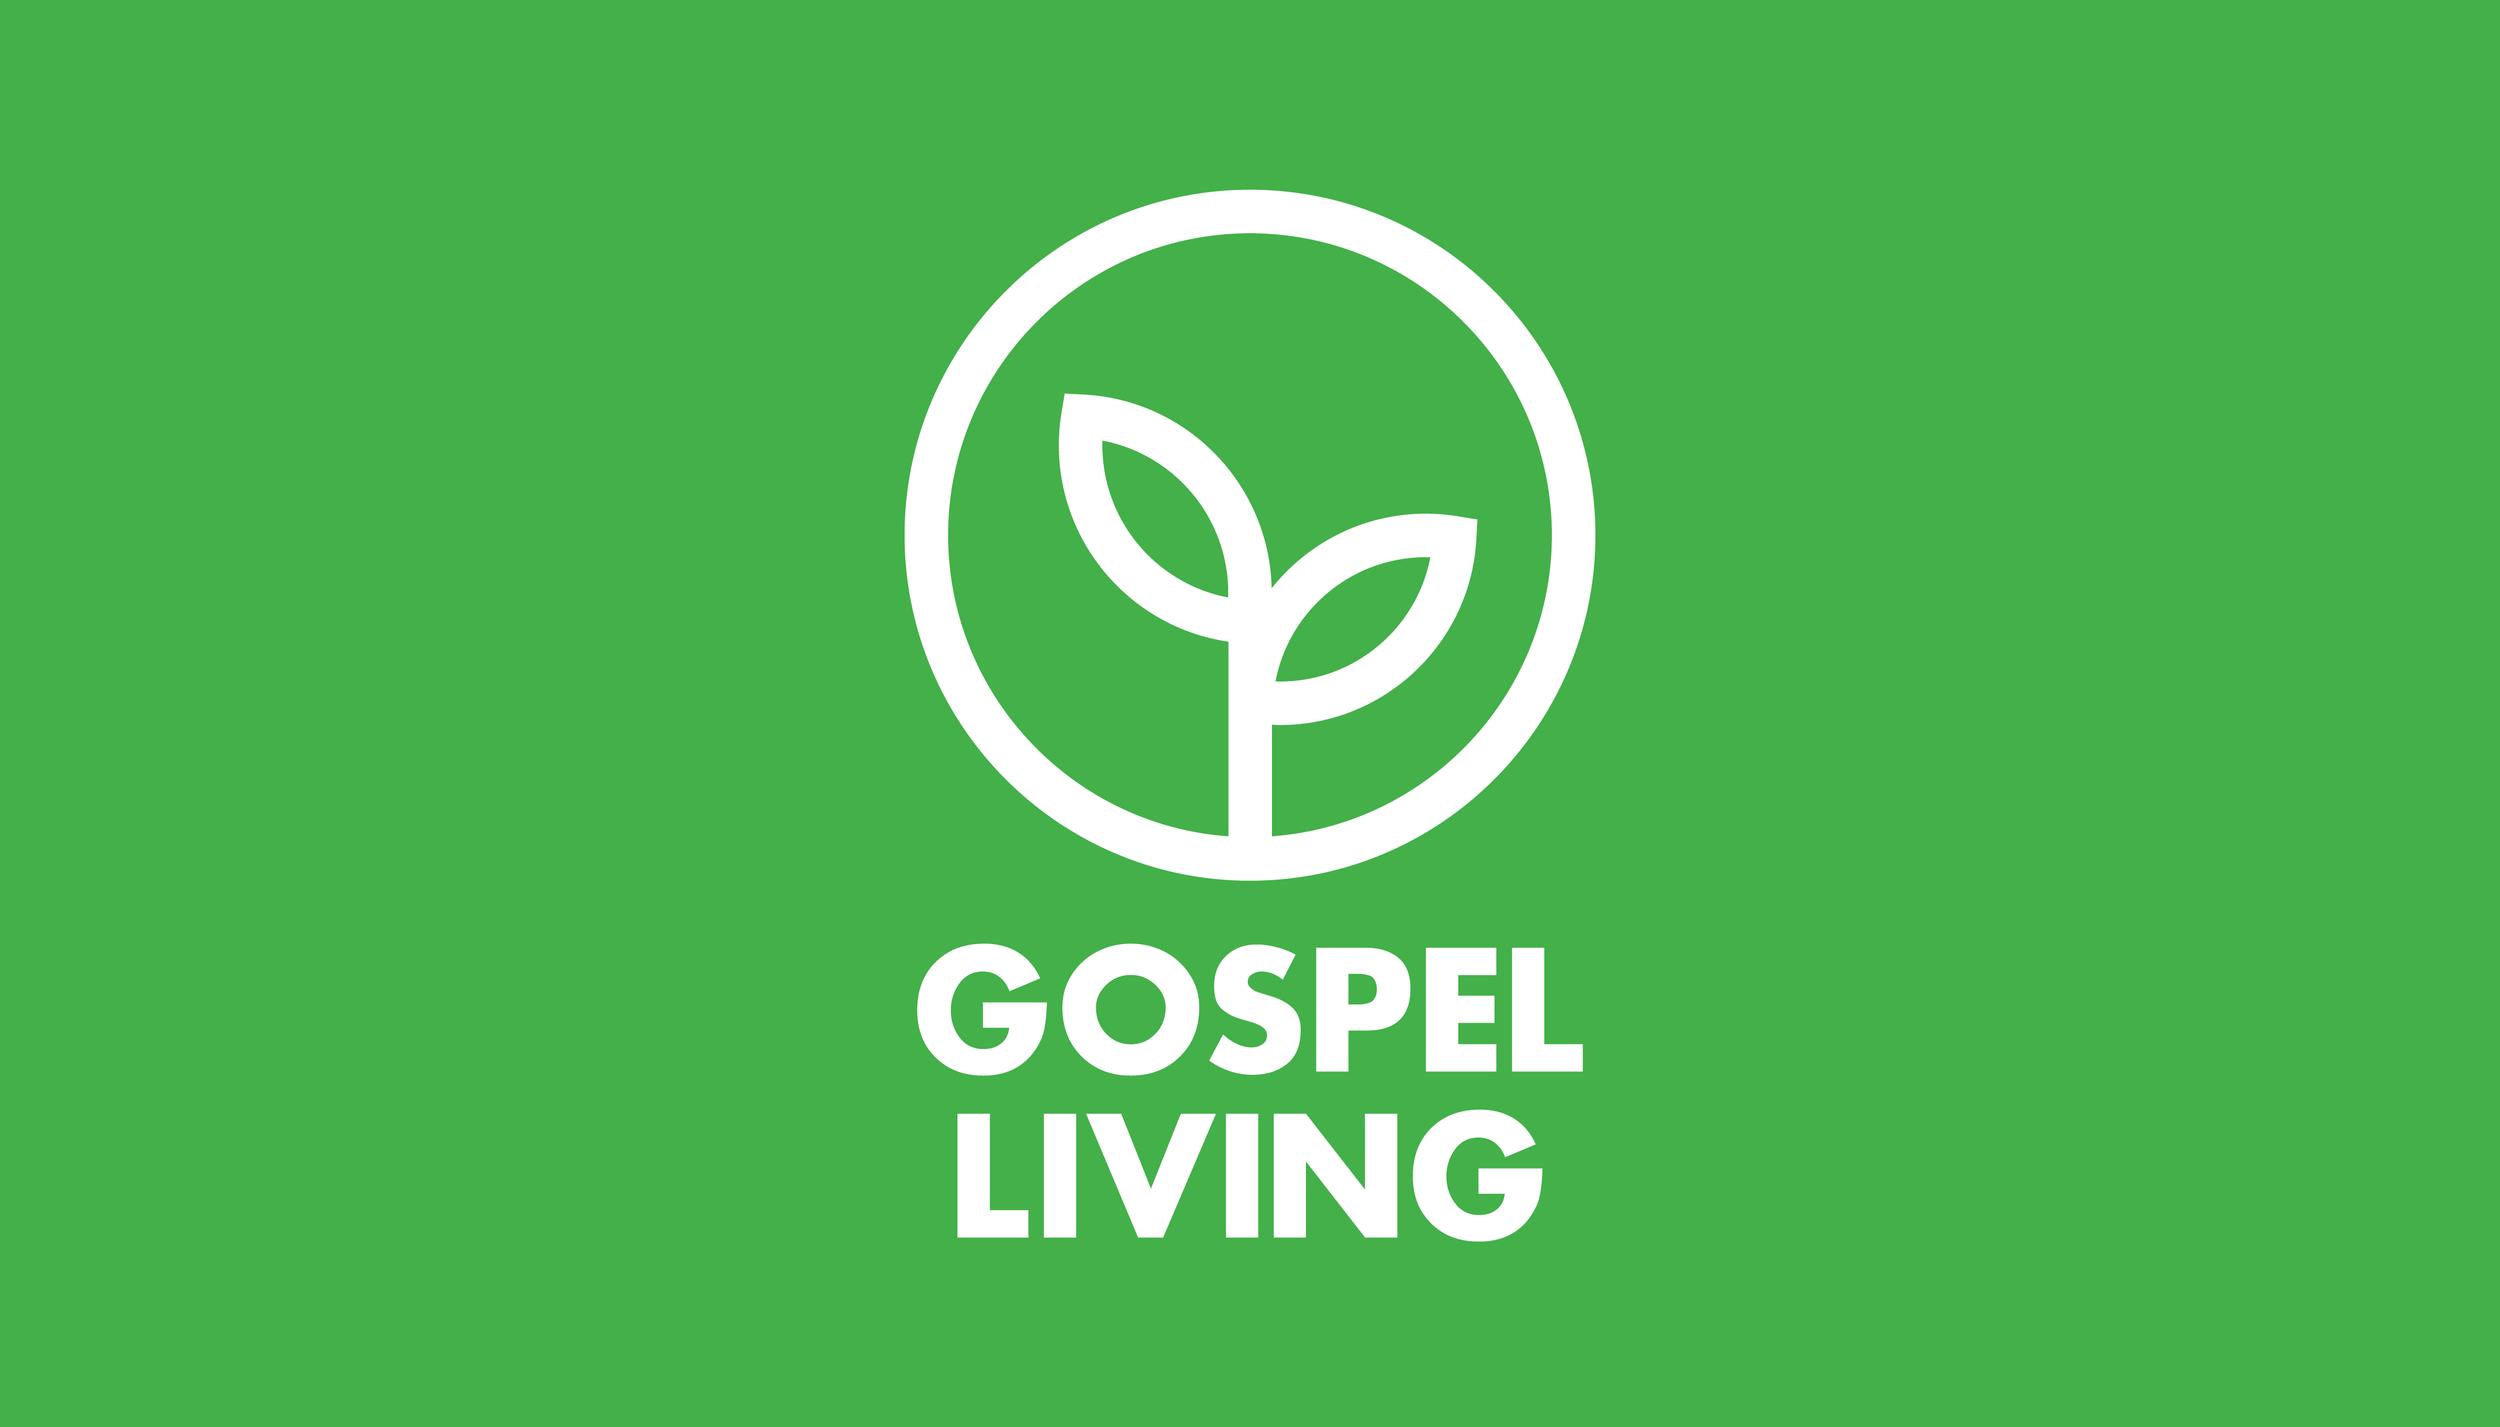 Gospel Living - Header.png